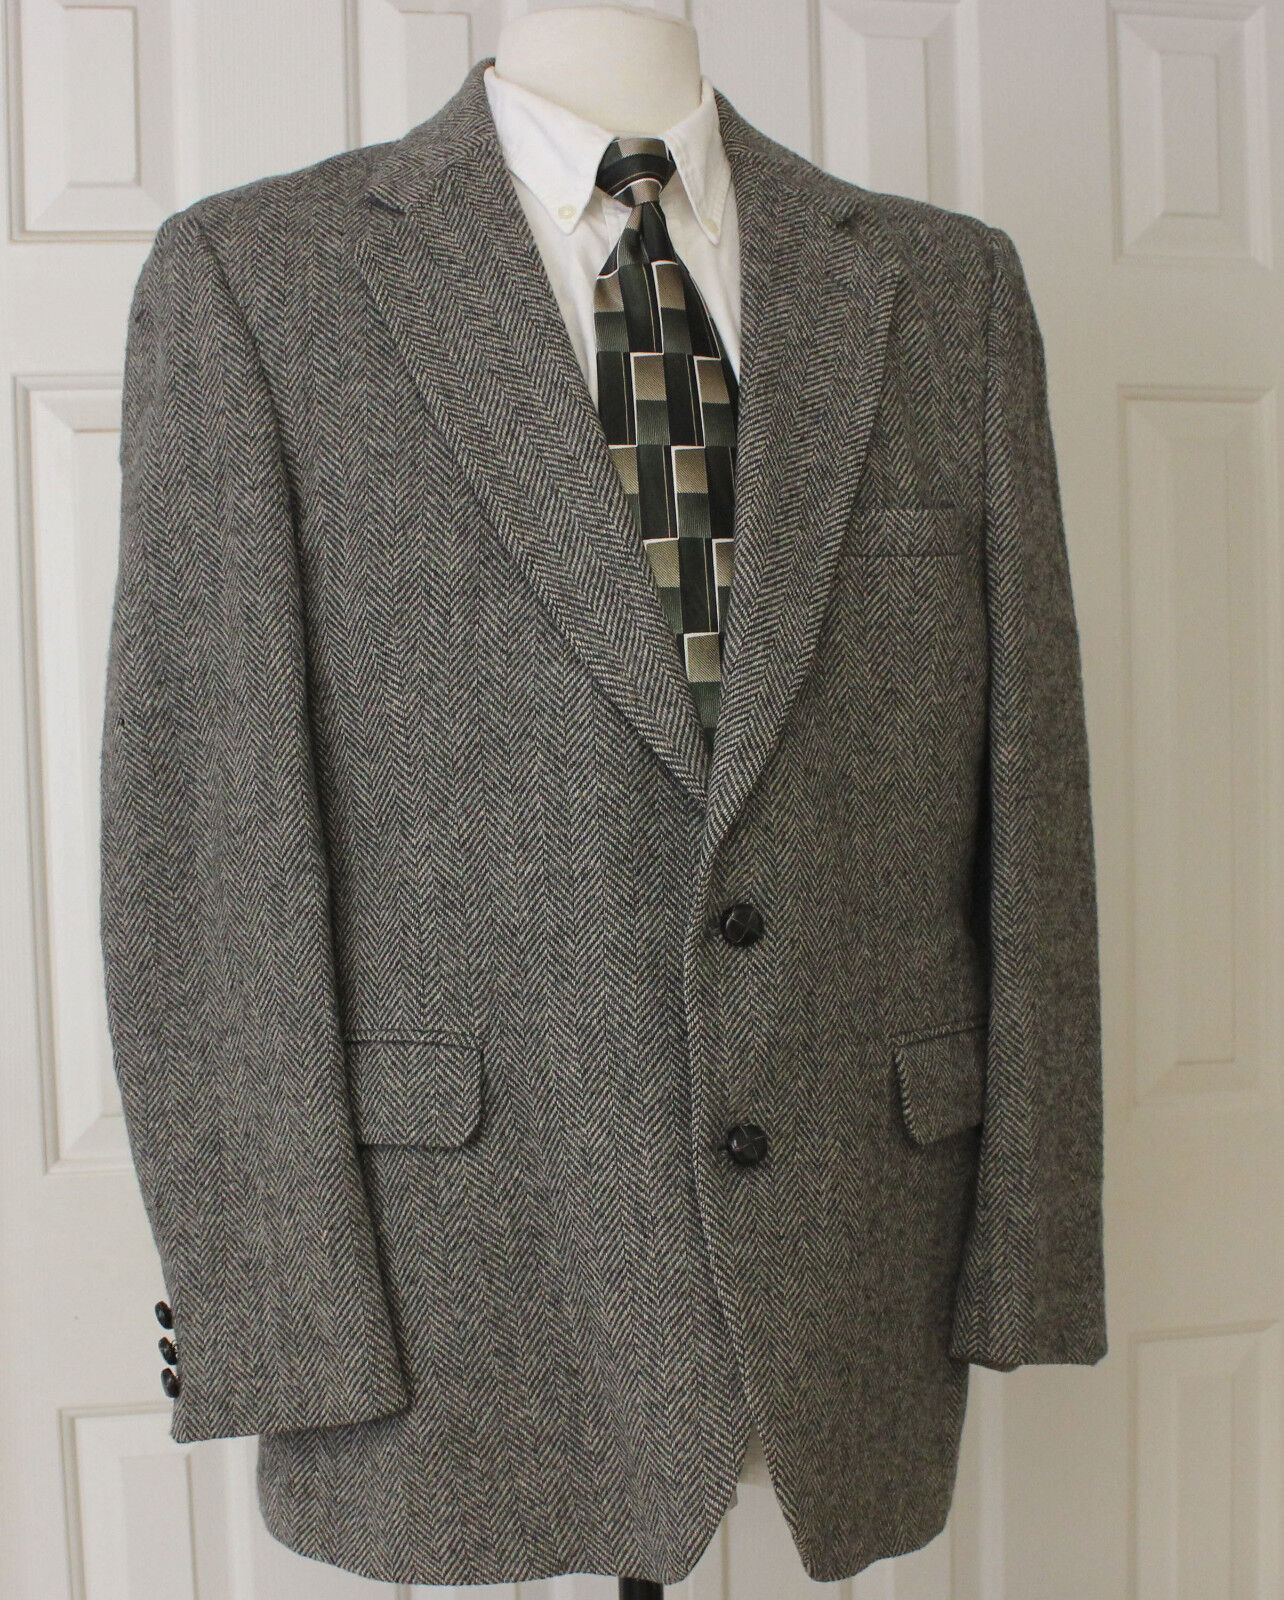 STAFFORD Sport Coat Leather Buttons 100% Wool Herringbone Mens Sz 44 R